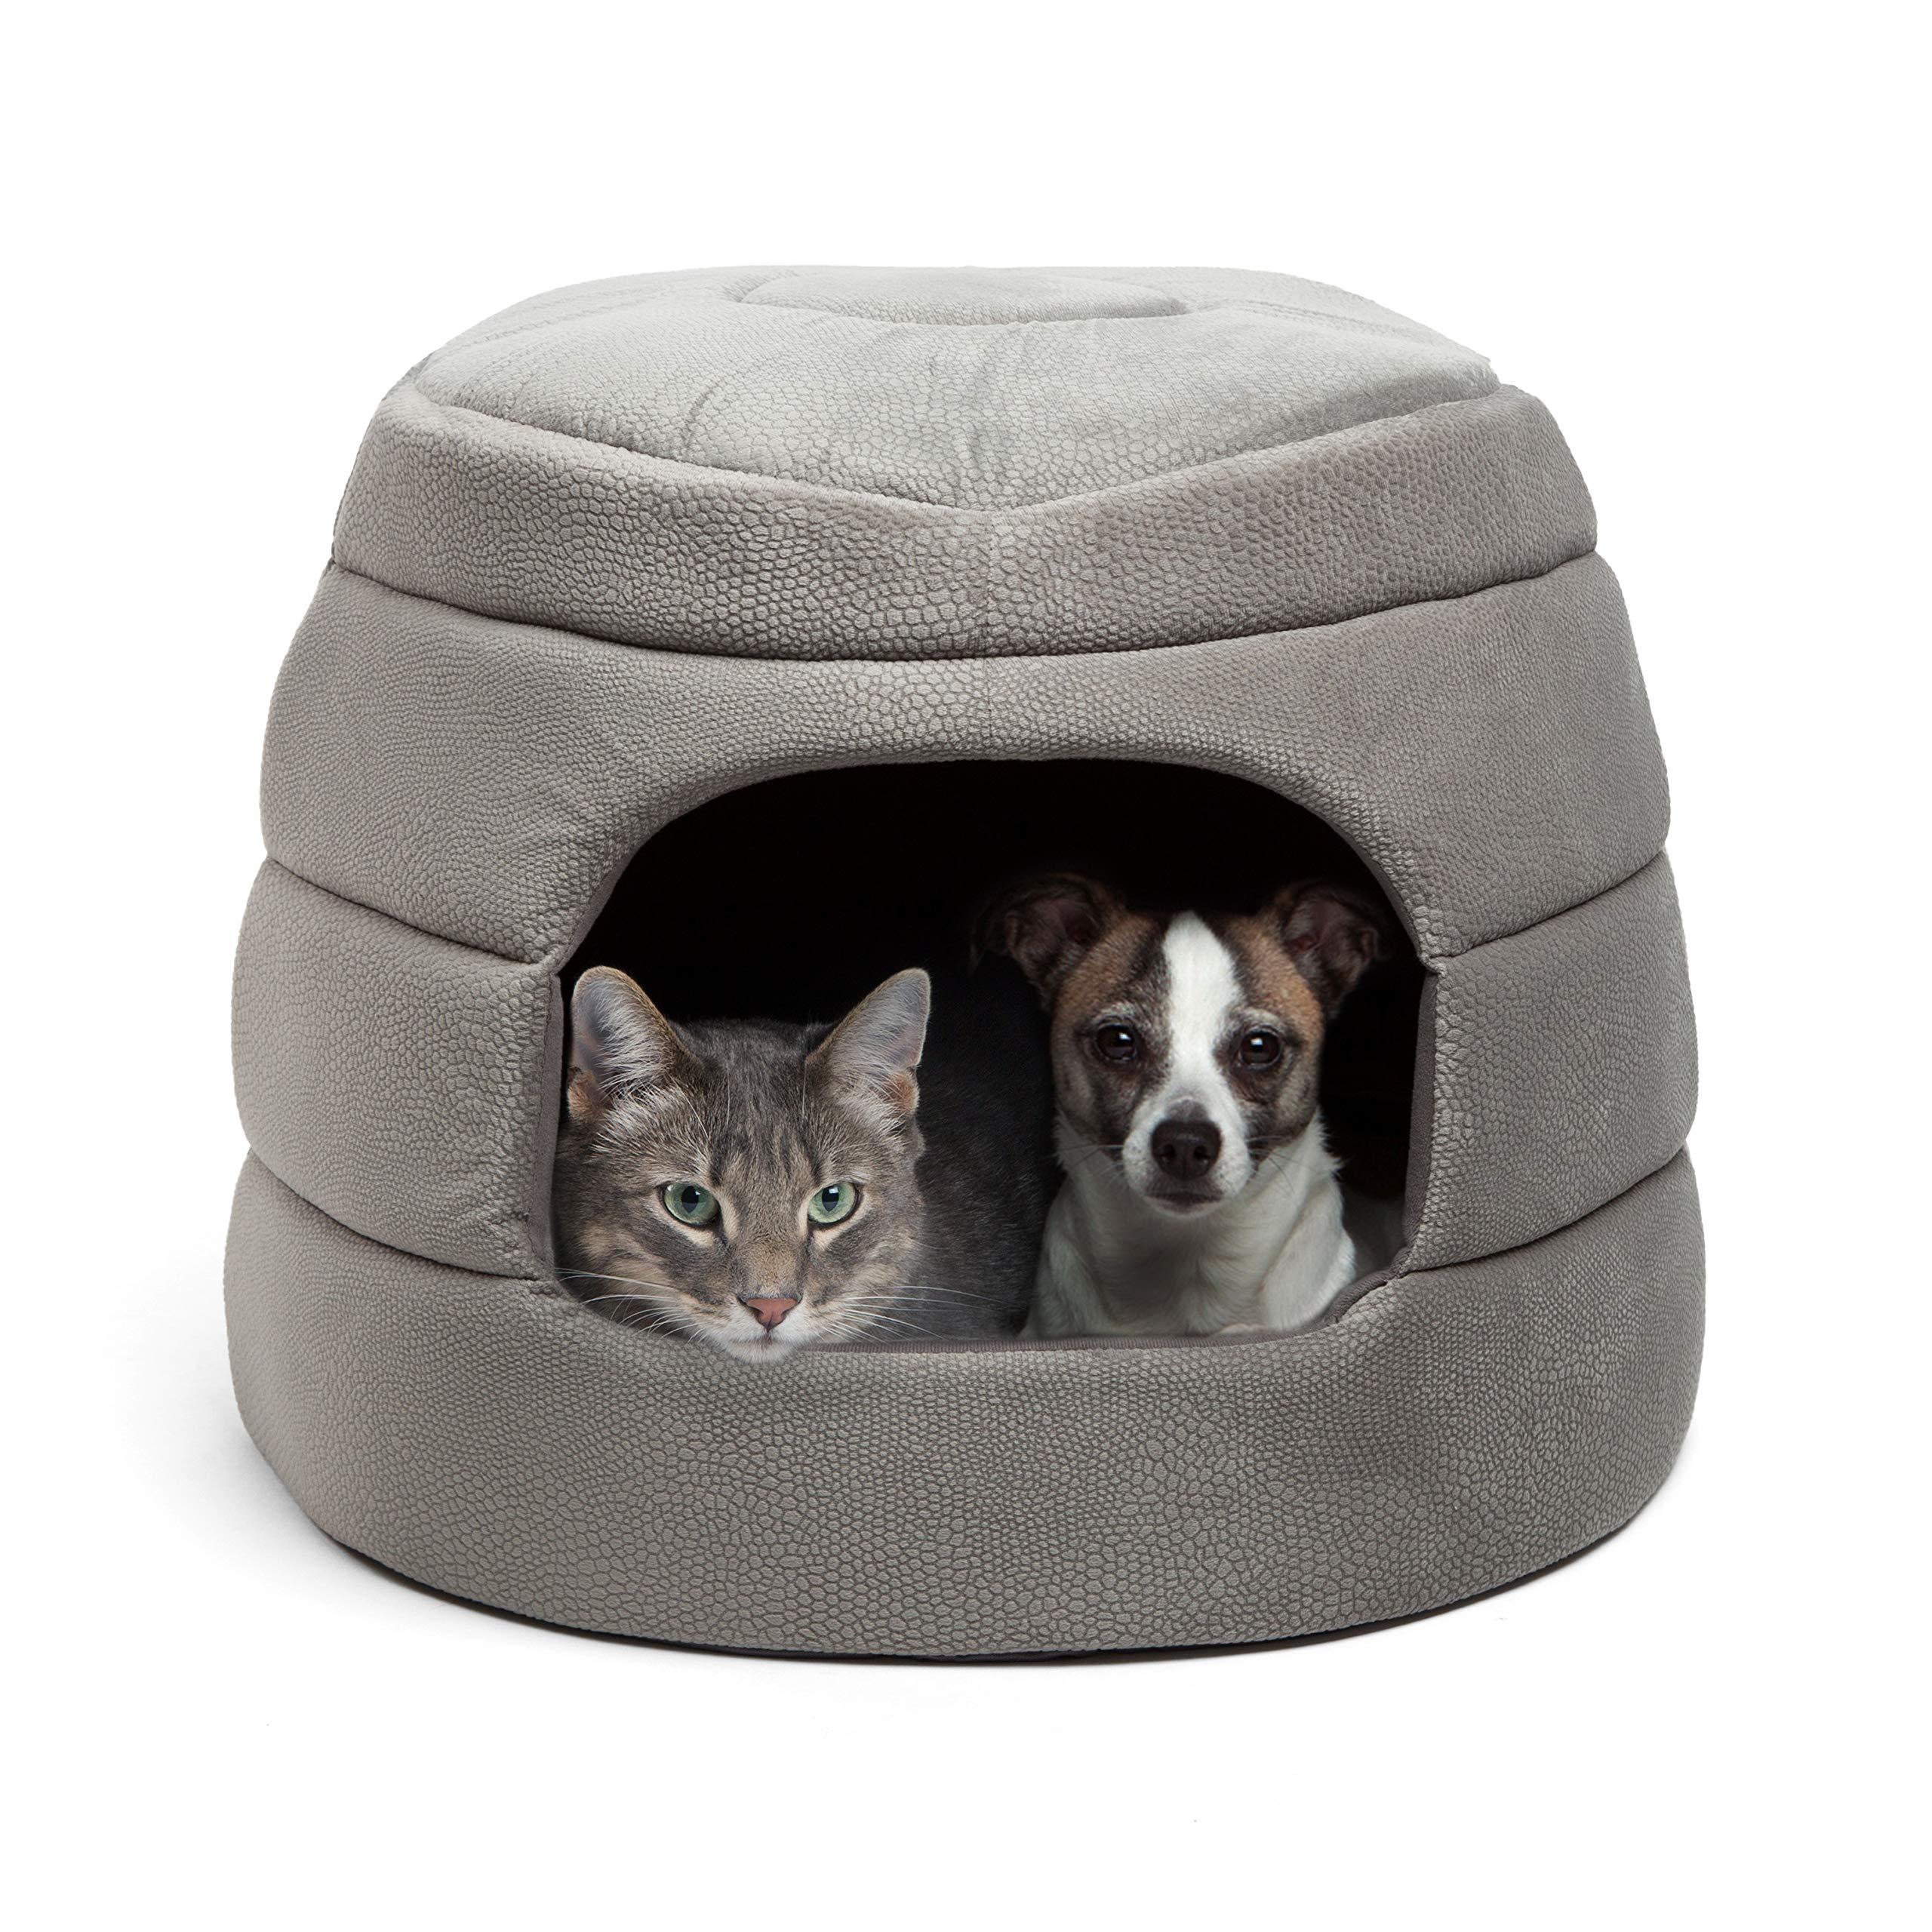 Best Friends by Sheri Honeycomb Hut-Cuddler, Grey, Jumbo by Best Friends by Sheri